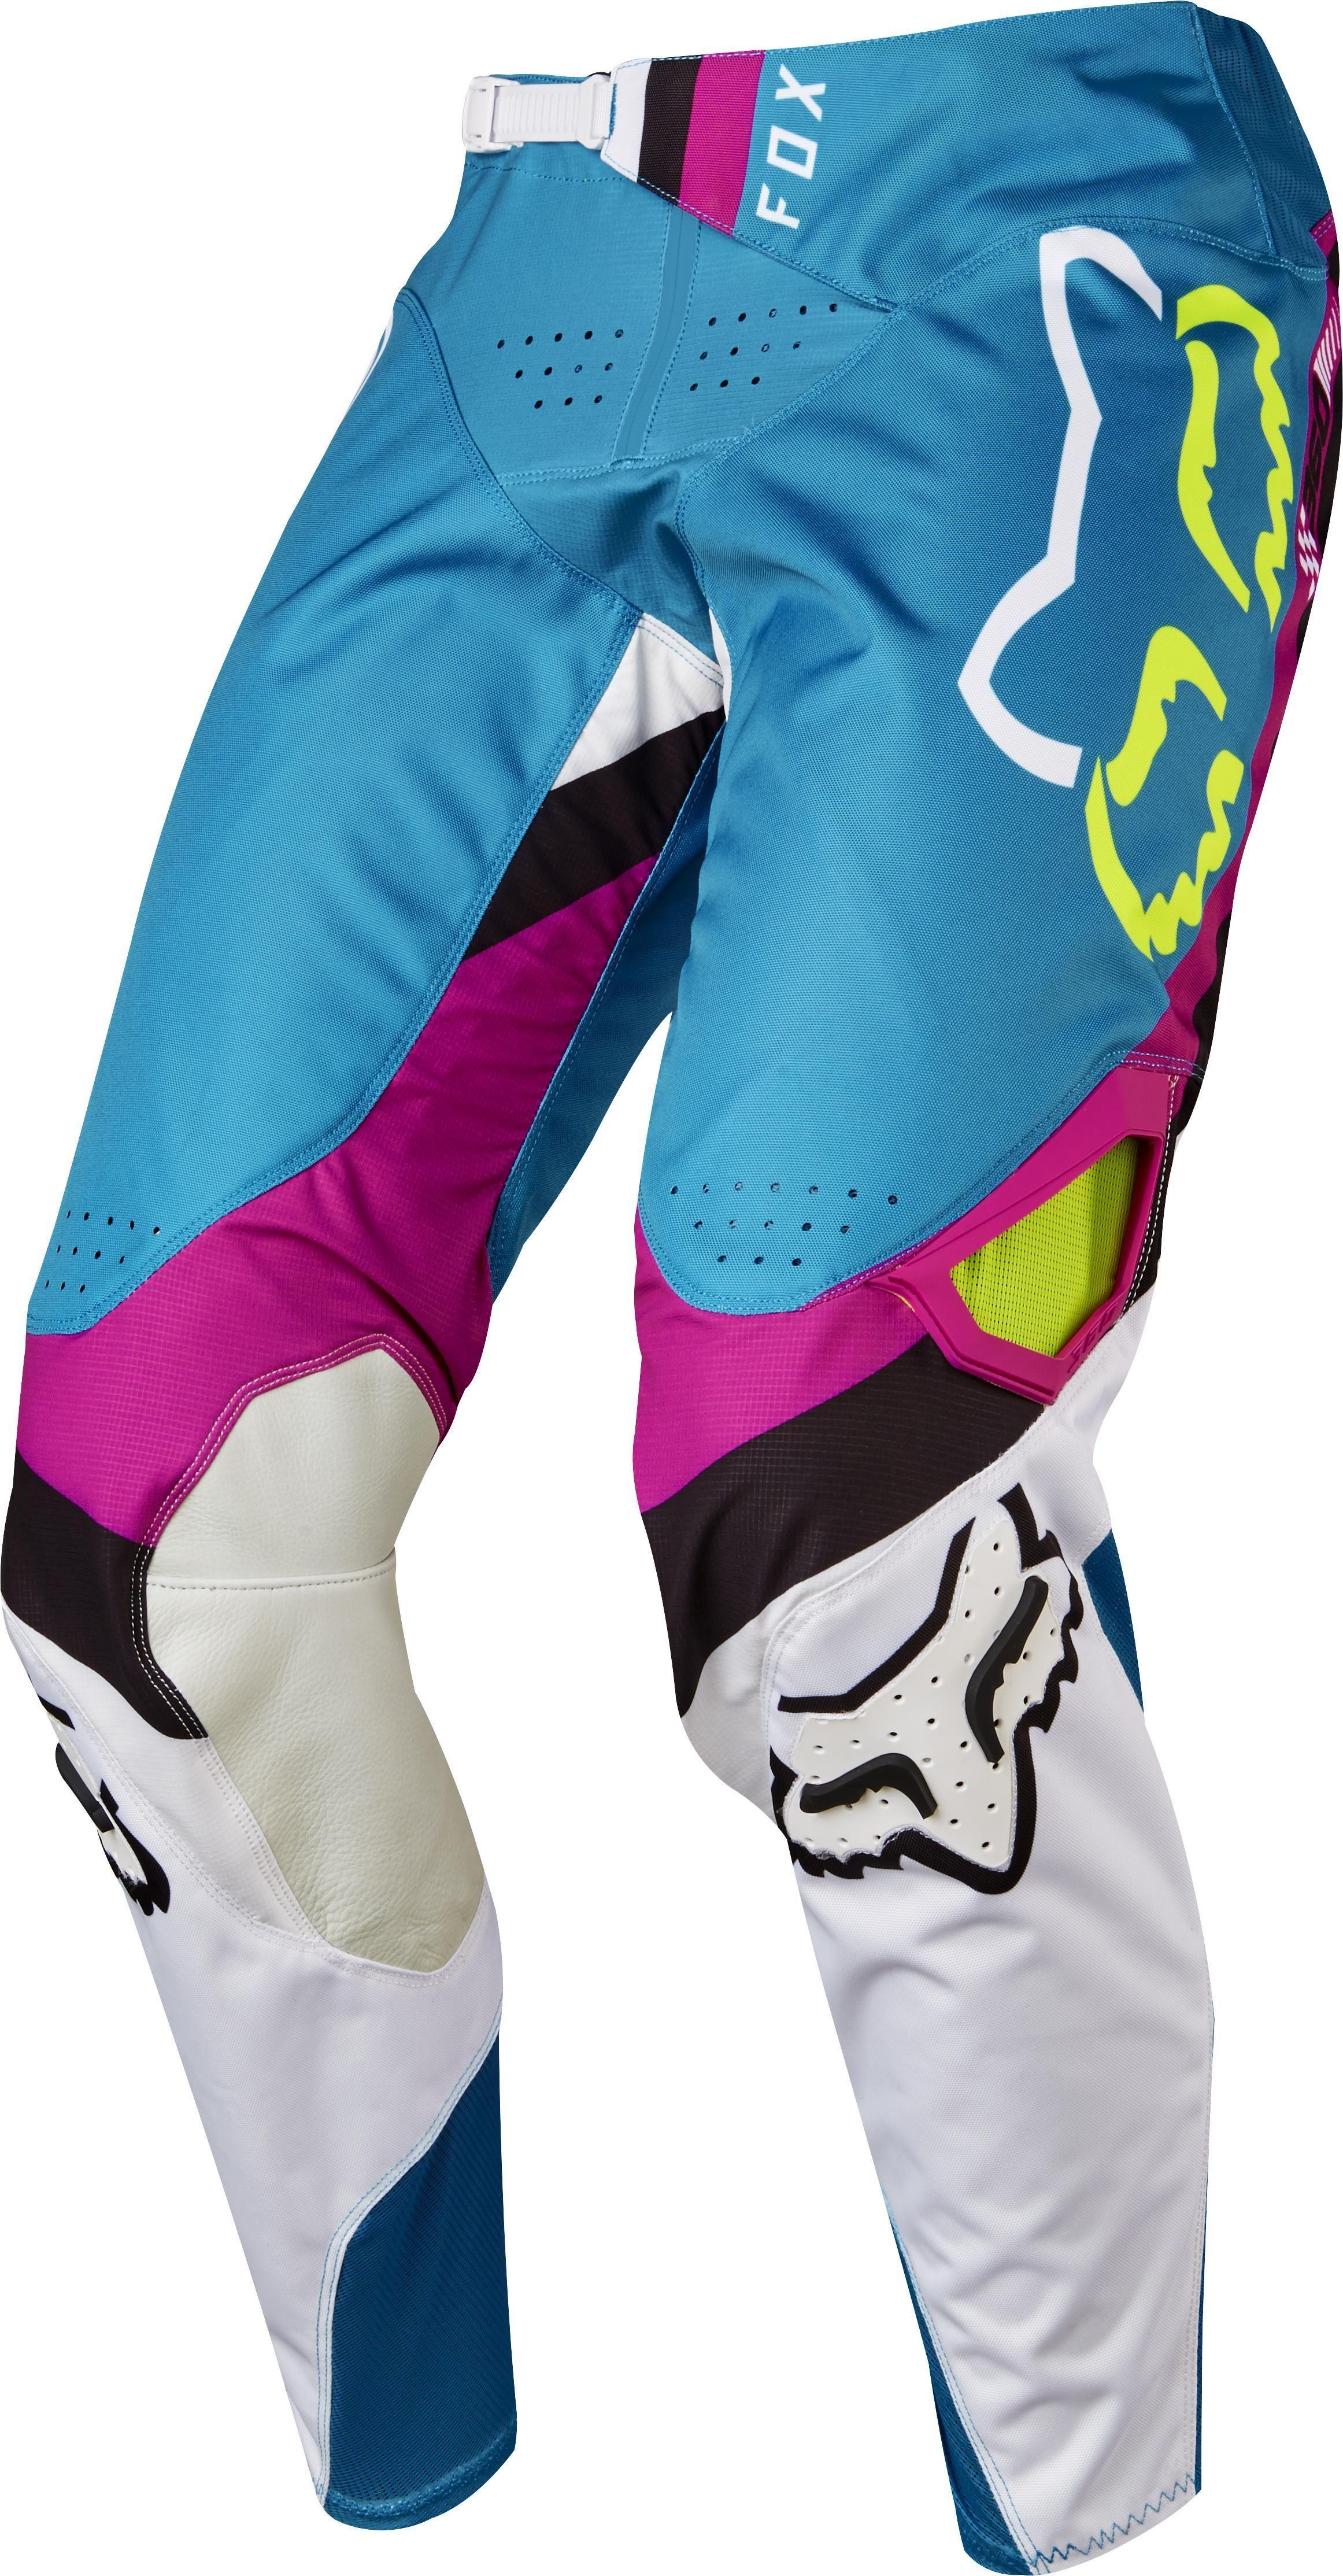 Fox 360 Rohr Pants Powersport Superstore Motocross Pants Blue White And Black Dirt Bike Gear